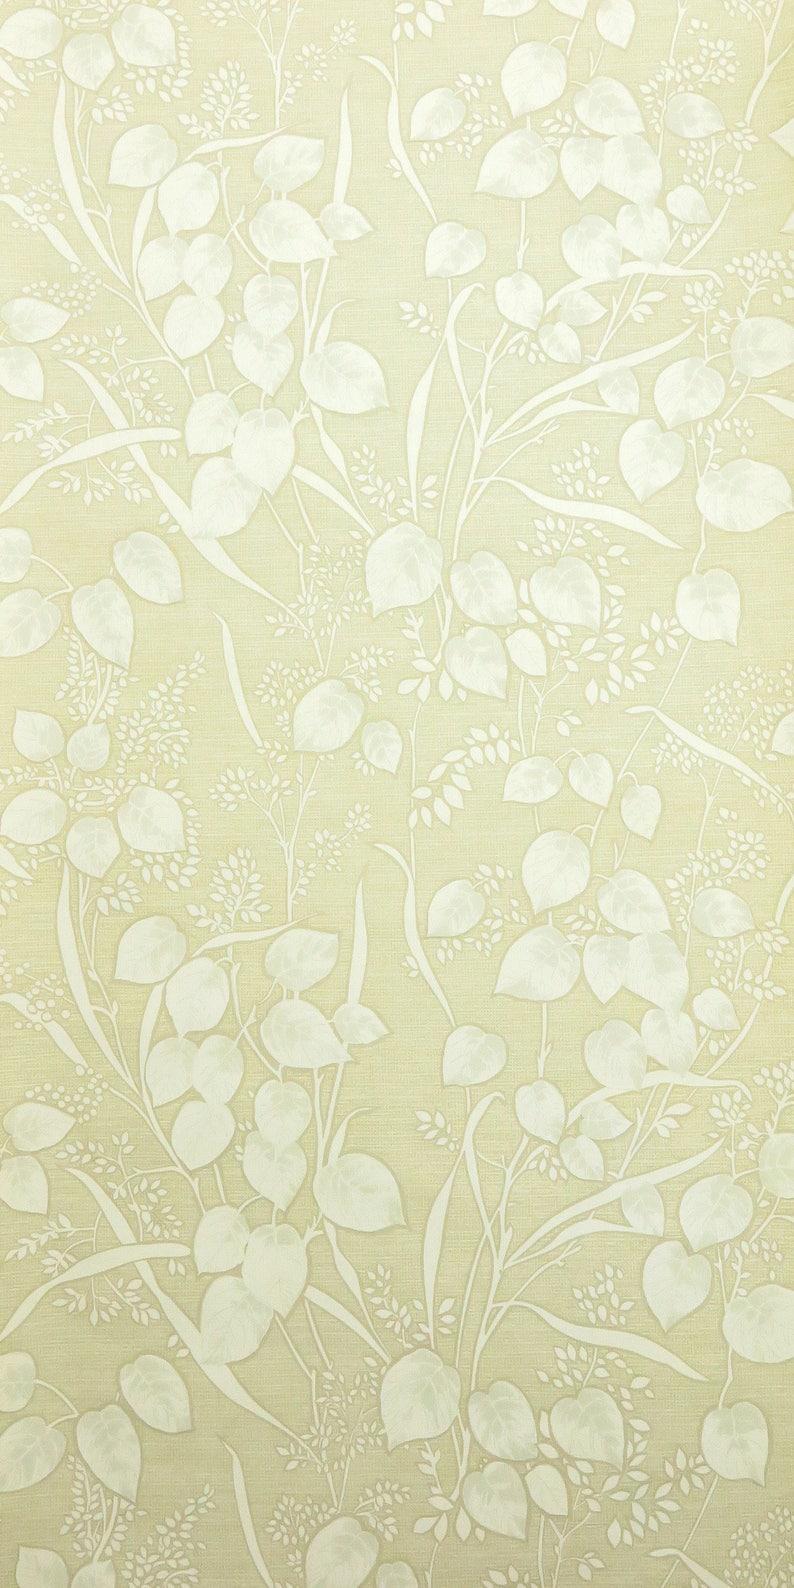 Vintage Wallpaper Lunaria per meter